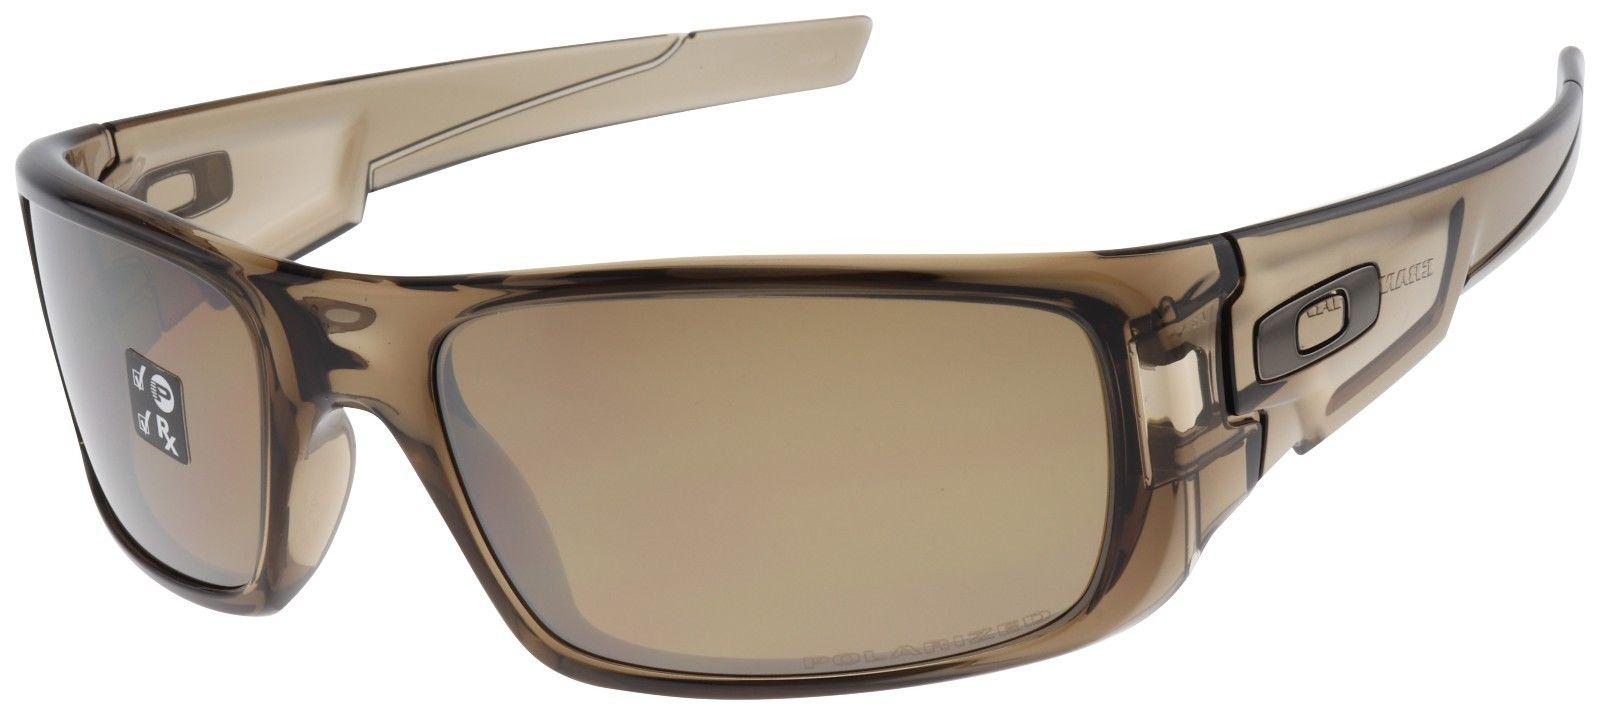 Oakley Crankshaft Sunglasses OO9239-07 Brown Smoke, $59.99